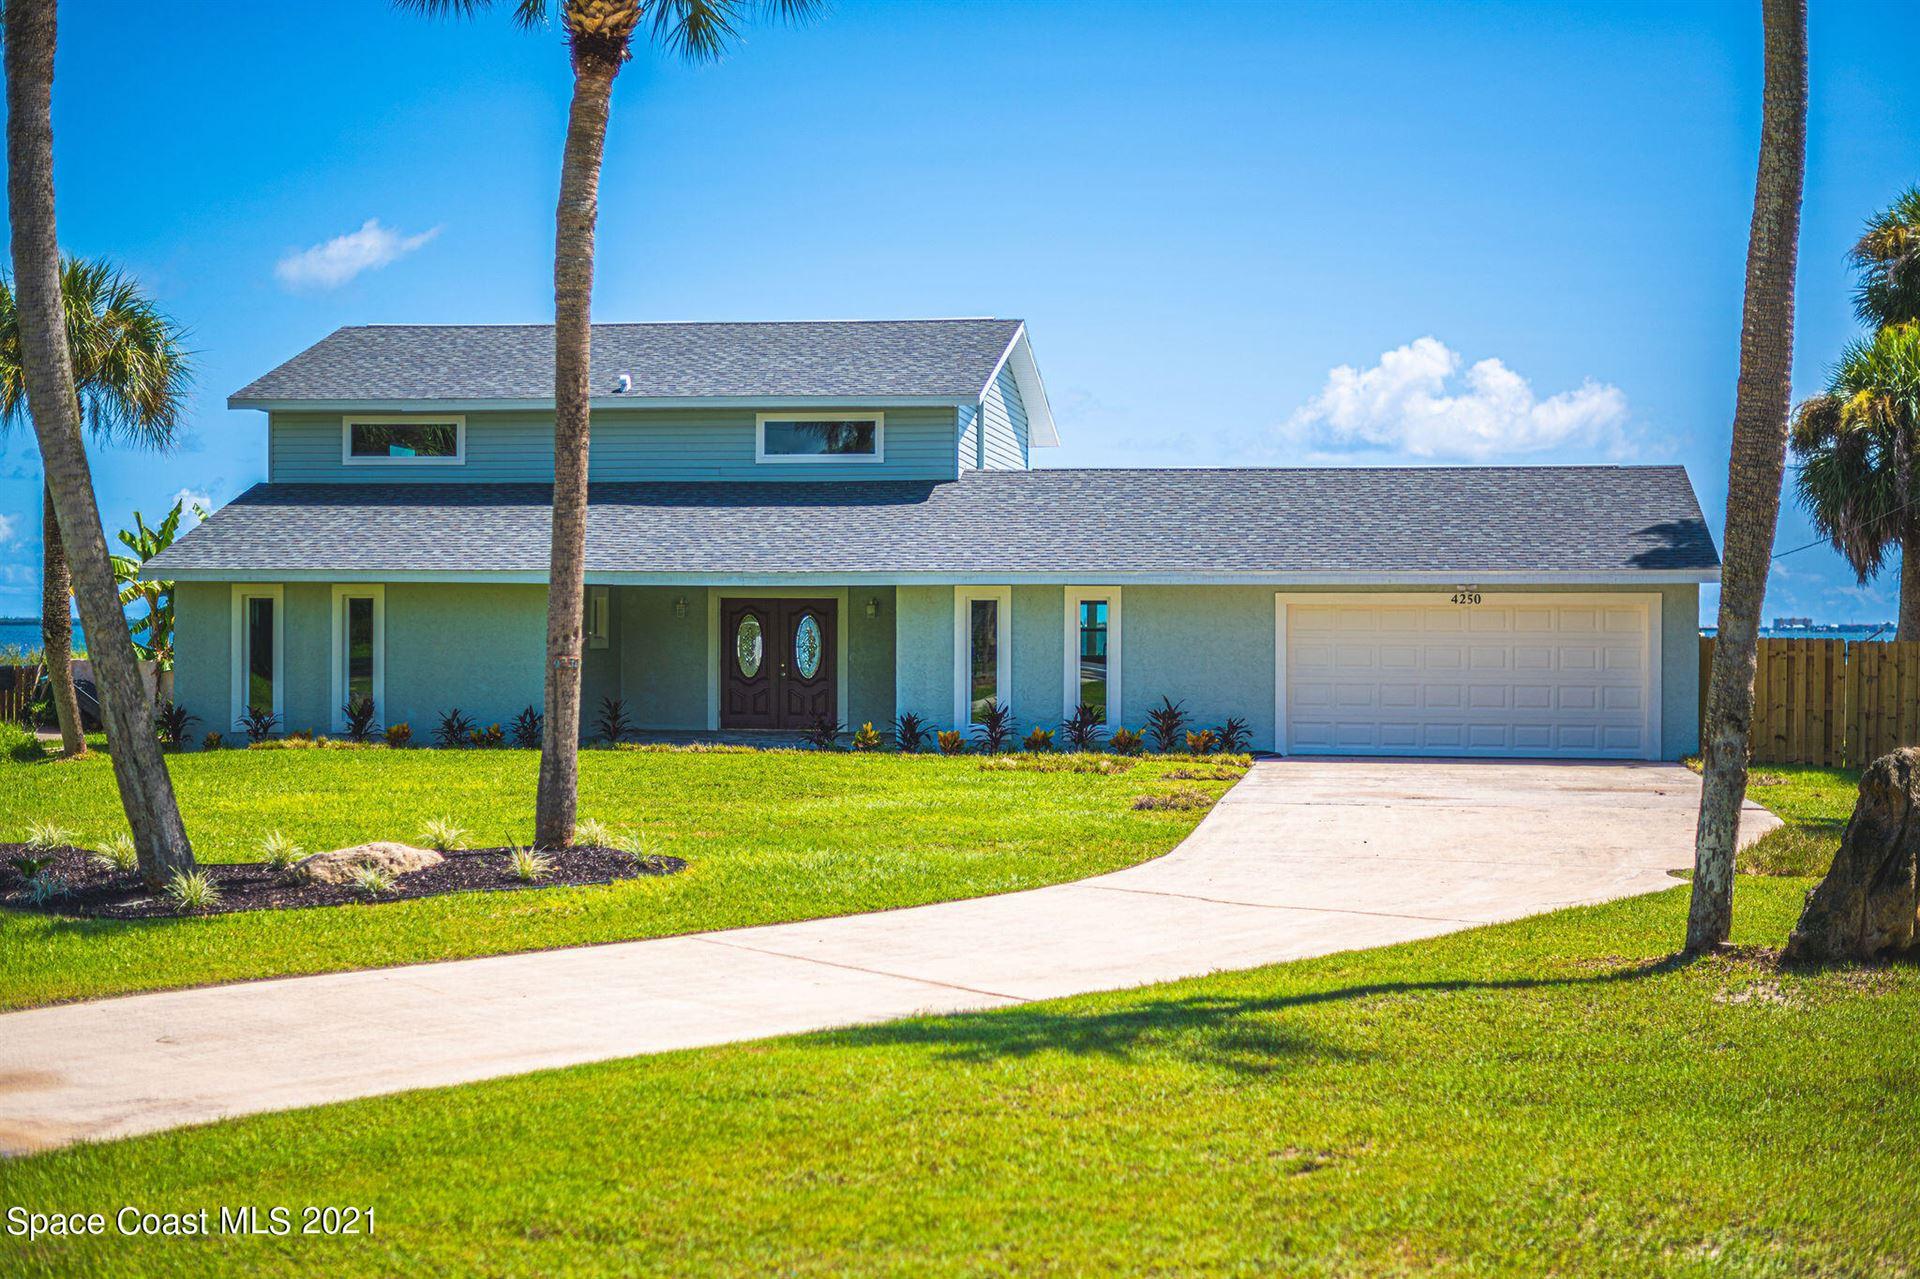 4250 S Tropical Trail                                                                               Merritt Island                                                                      , FL - $1,200,000